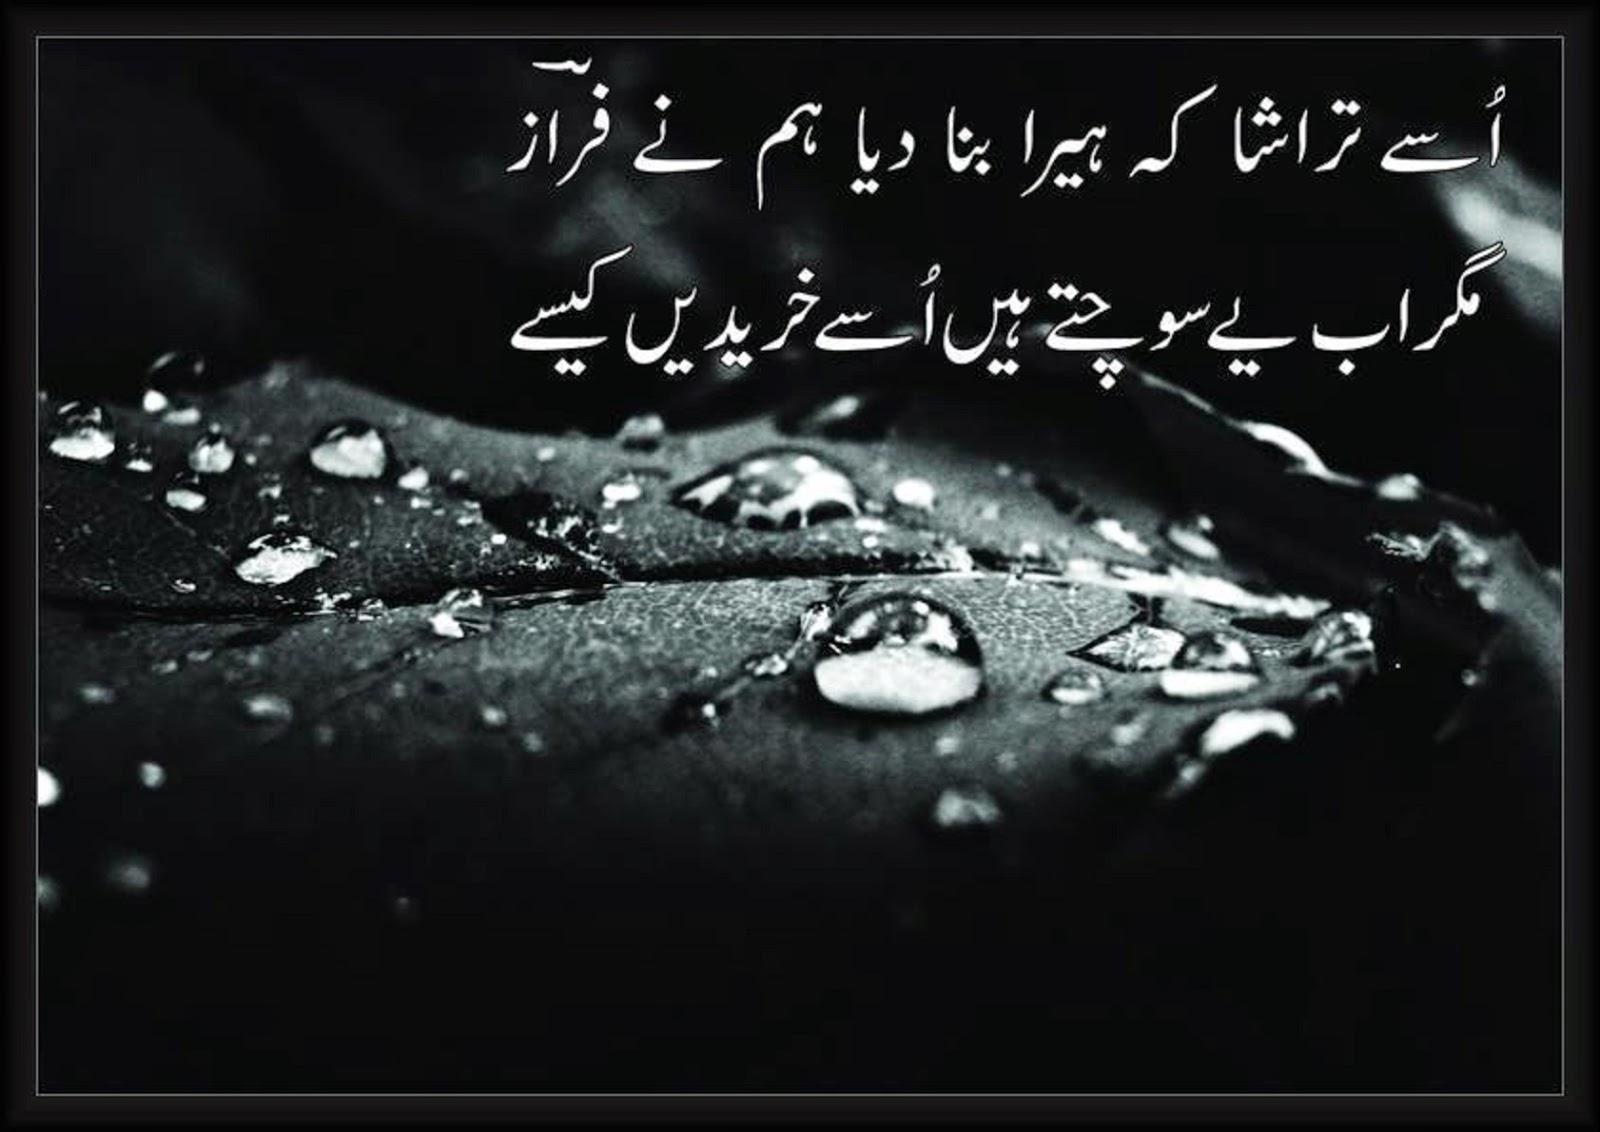 Download HD Wallpapers 3D Beautiful Sad Urdu Poetry HD 1600x1132